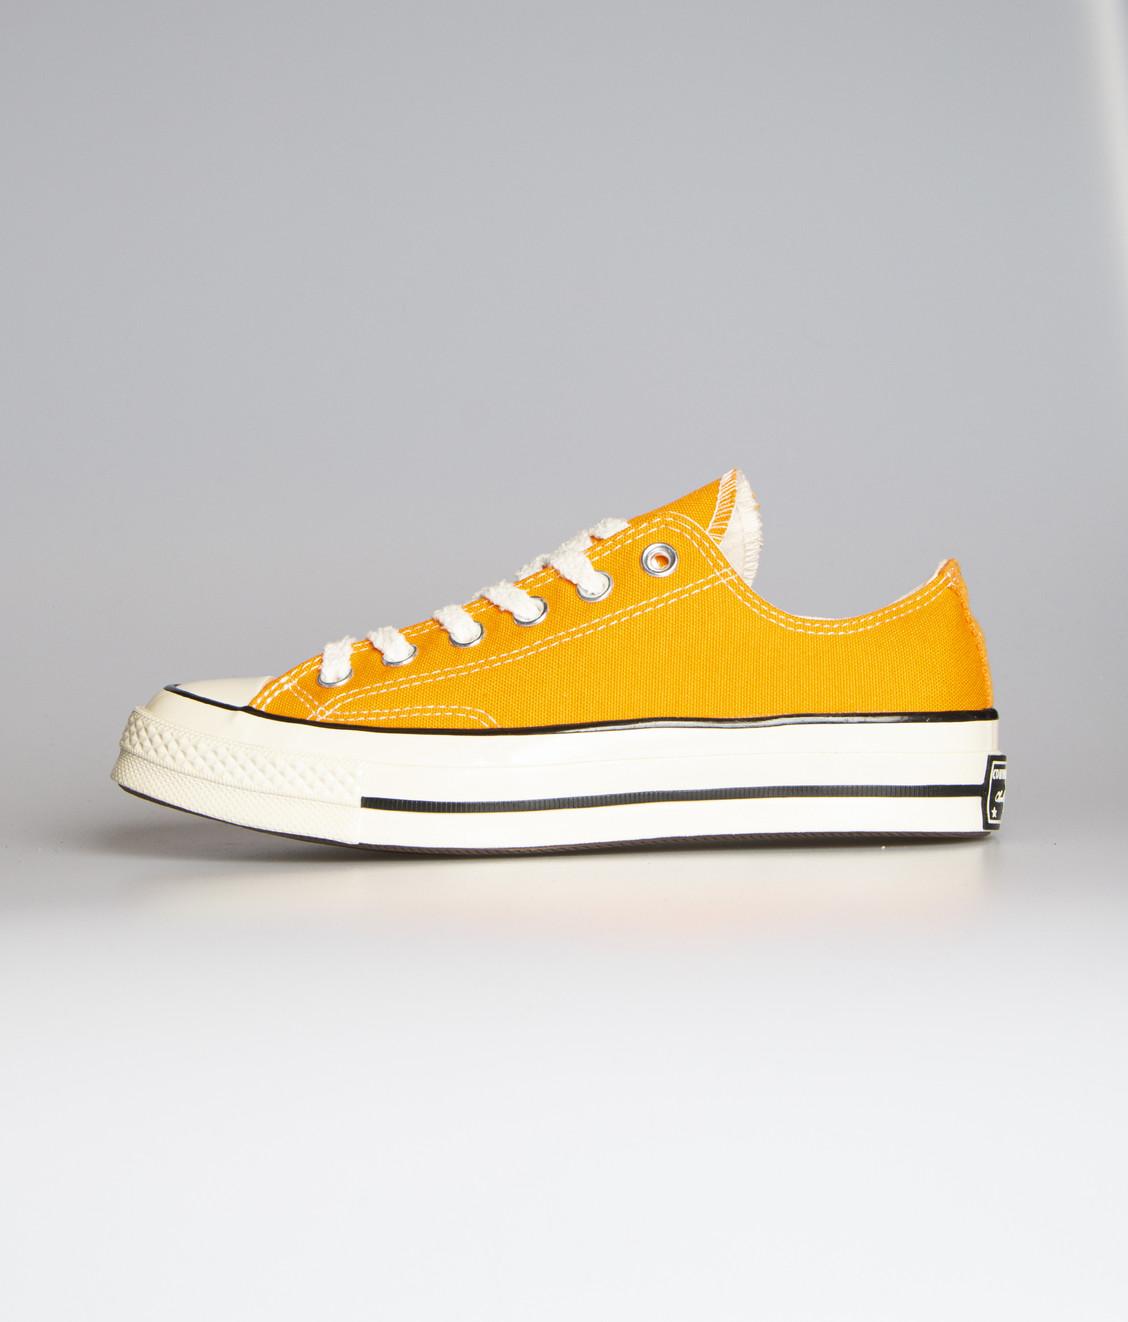 Converse Chuck 70 Ox Orange Rind